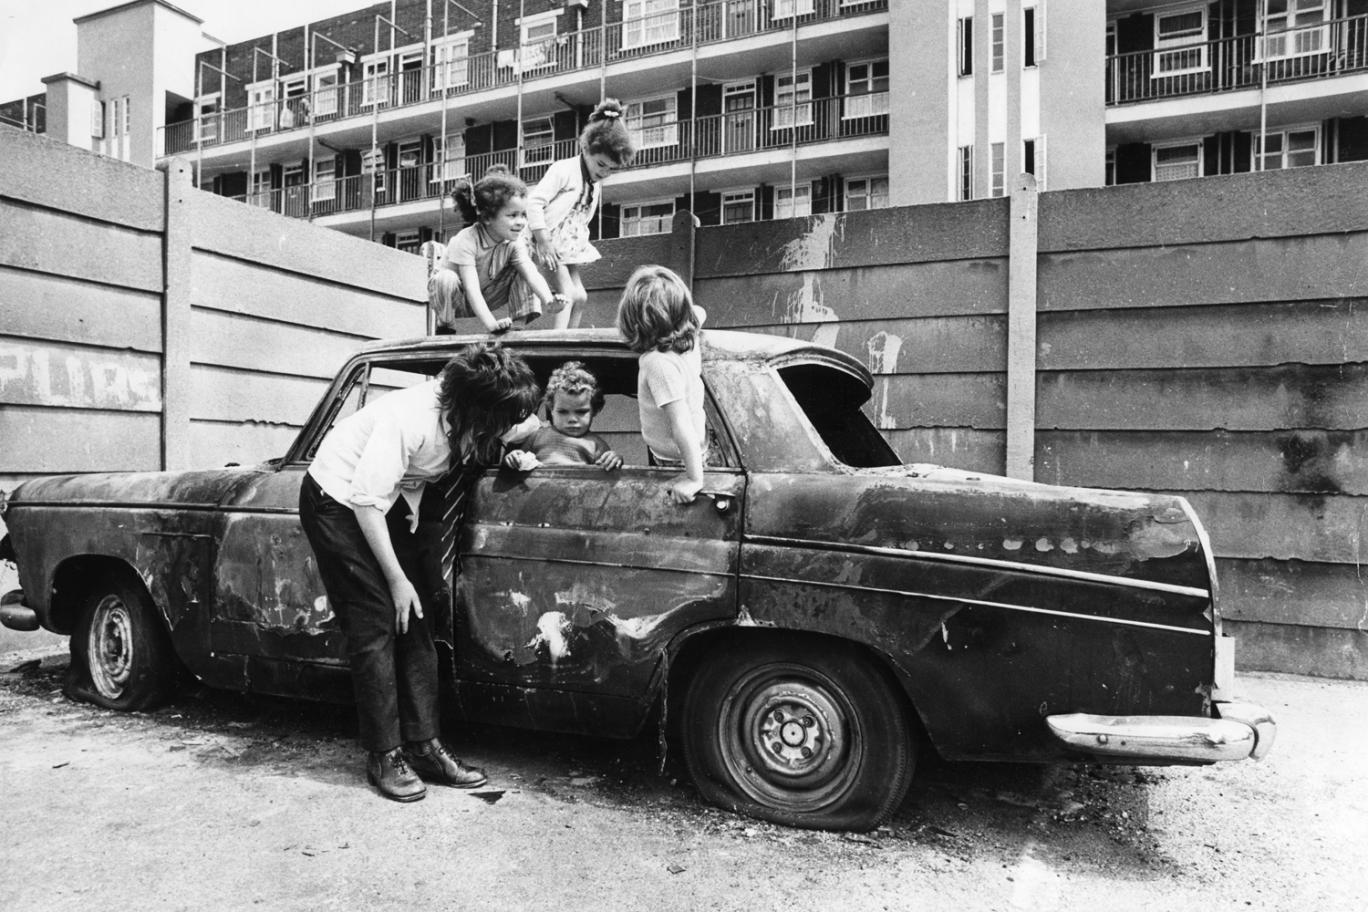 Hackney's Stonebridge Estate, 1973